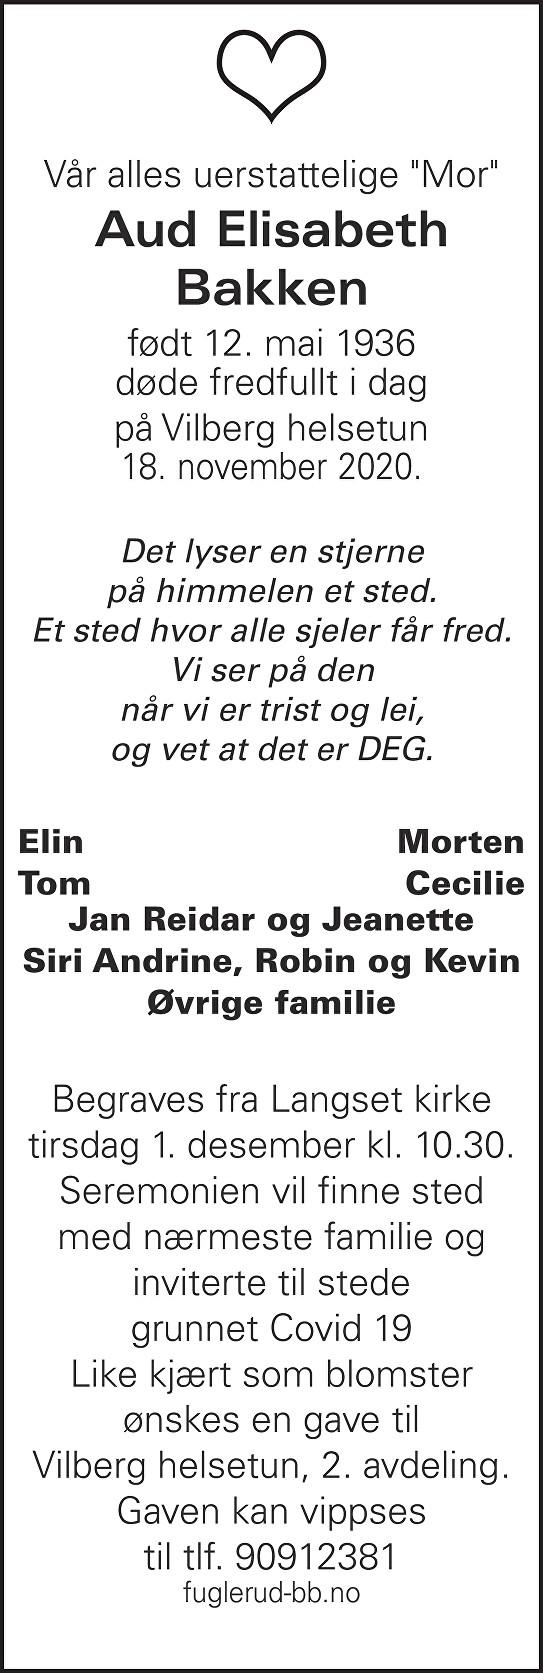 Aud Elisabeth Bakken Dødsannonse